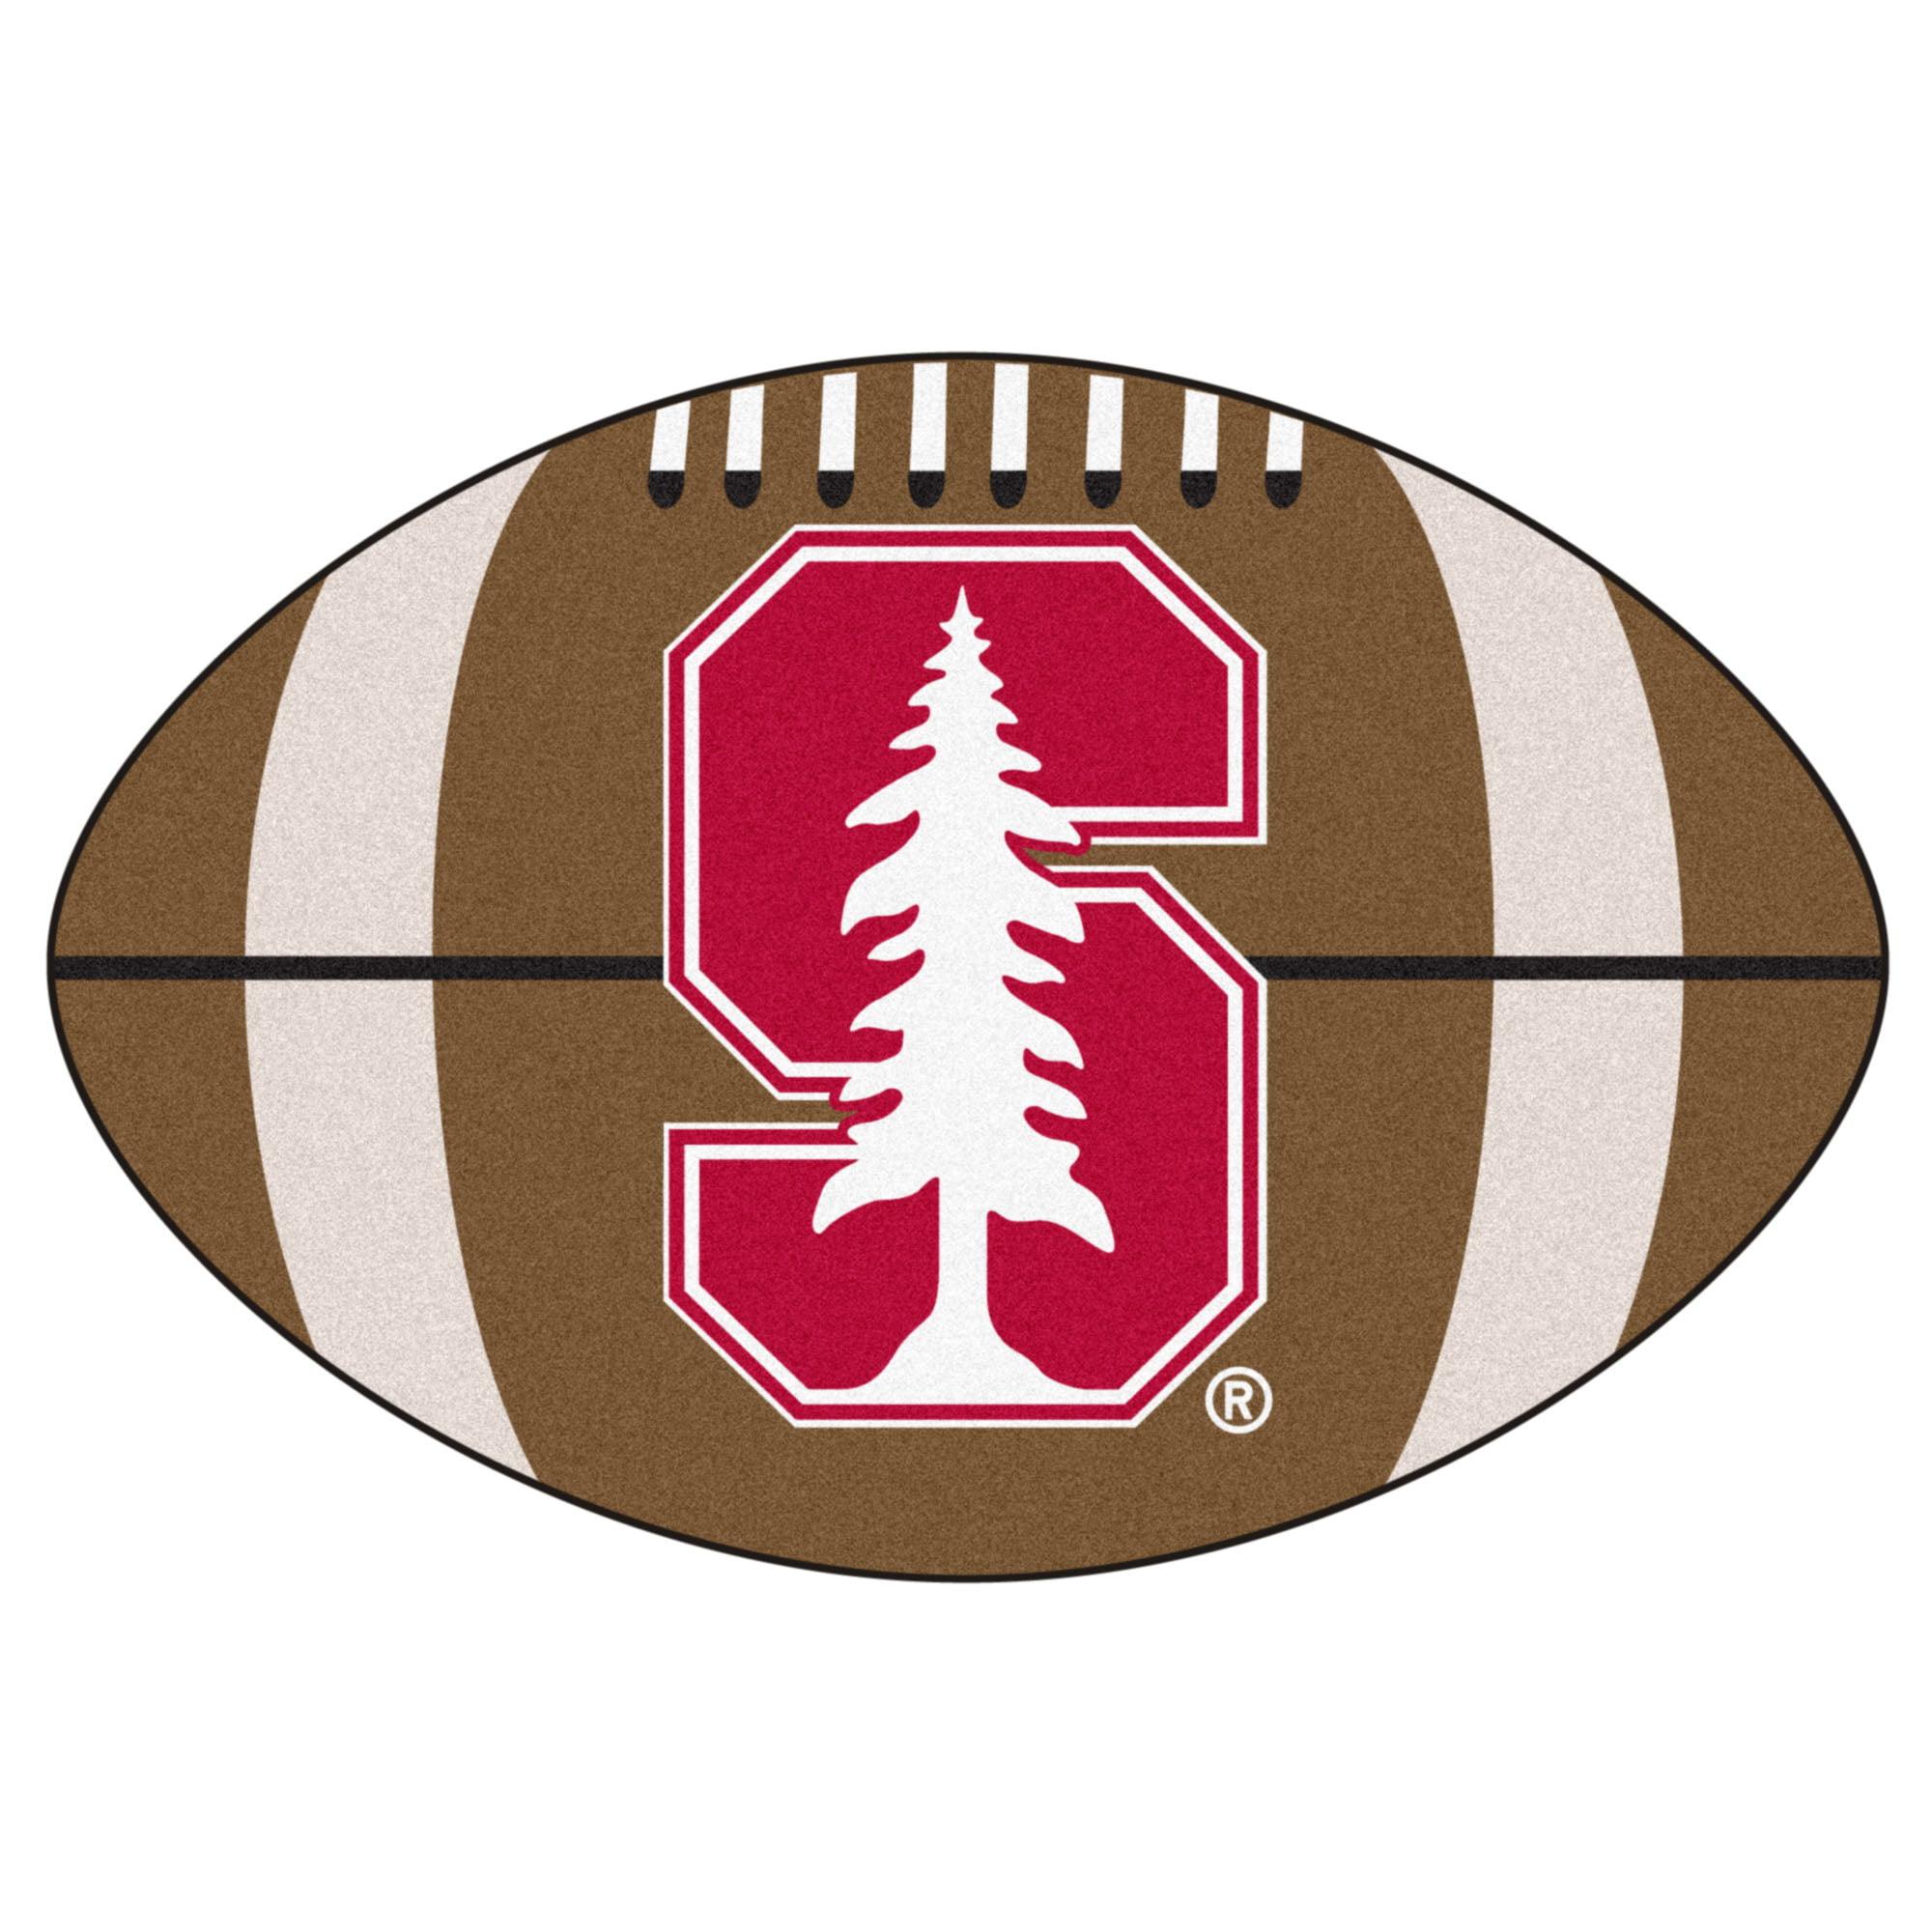 NCAA Stanford University Cardinal Football Shaped Mat Area Rug